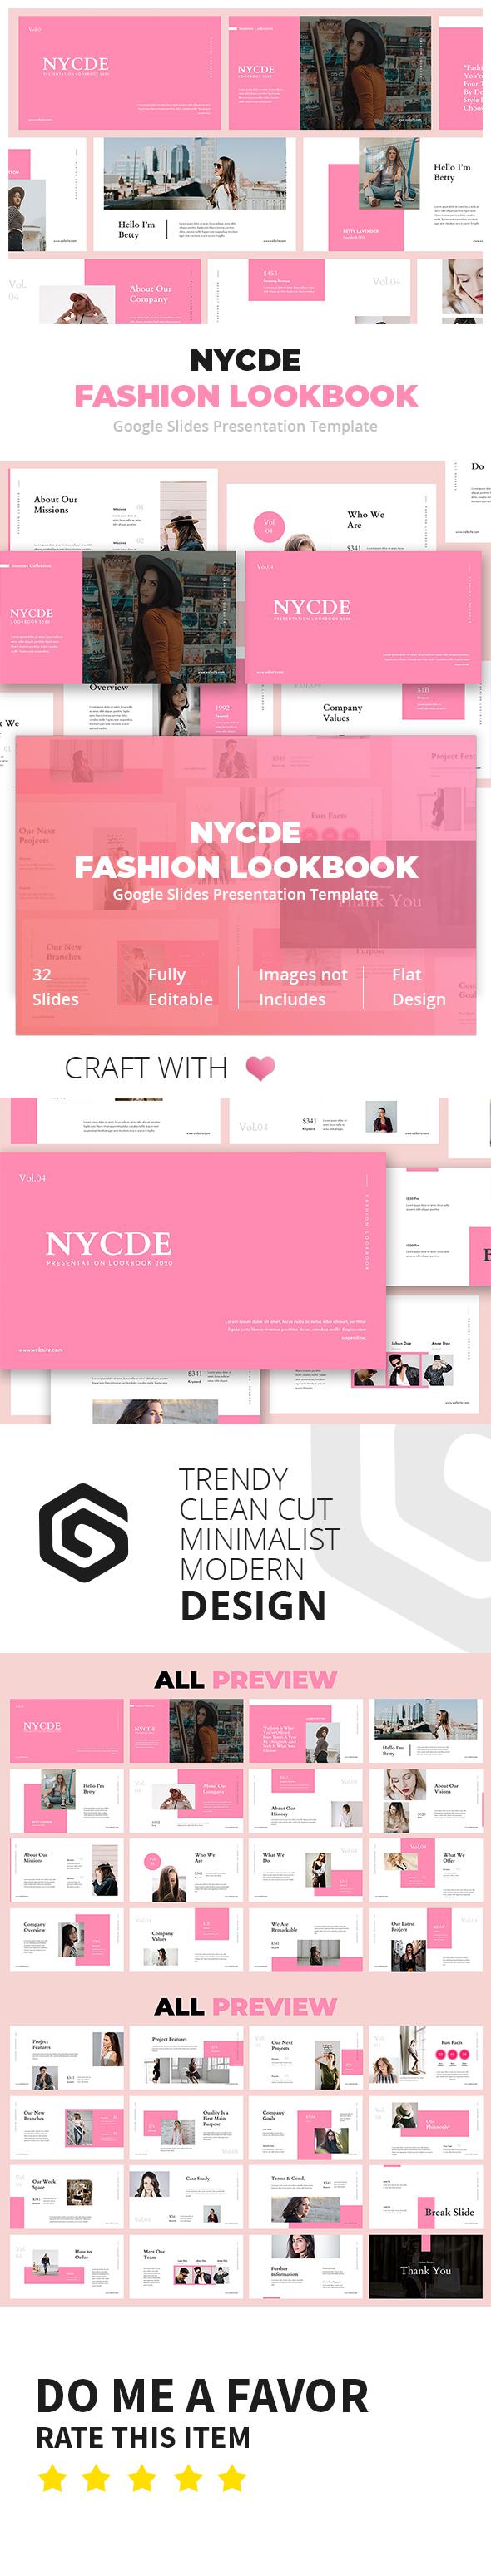 Nycde Fashion Lookbook Google Slides